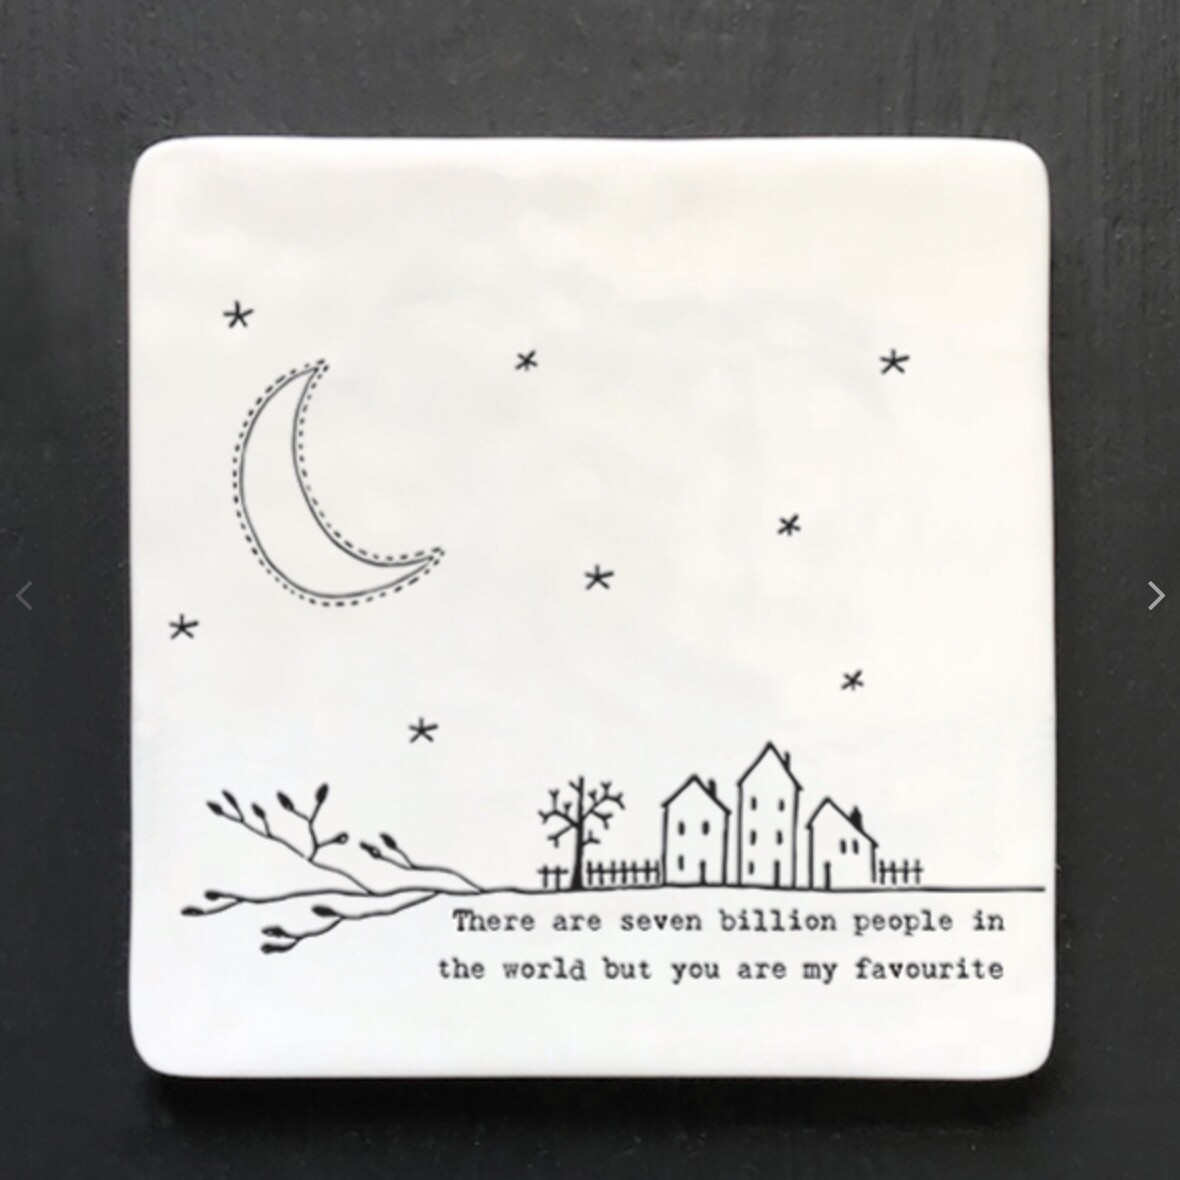 East of India Ceramic Coaster - Seven Billion People